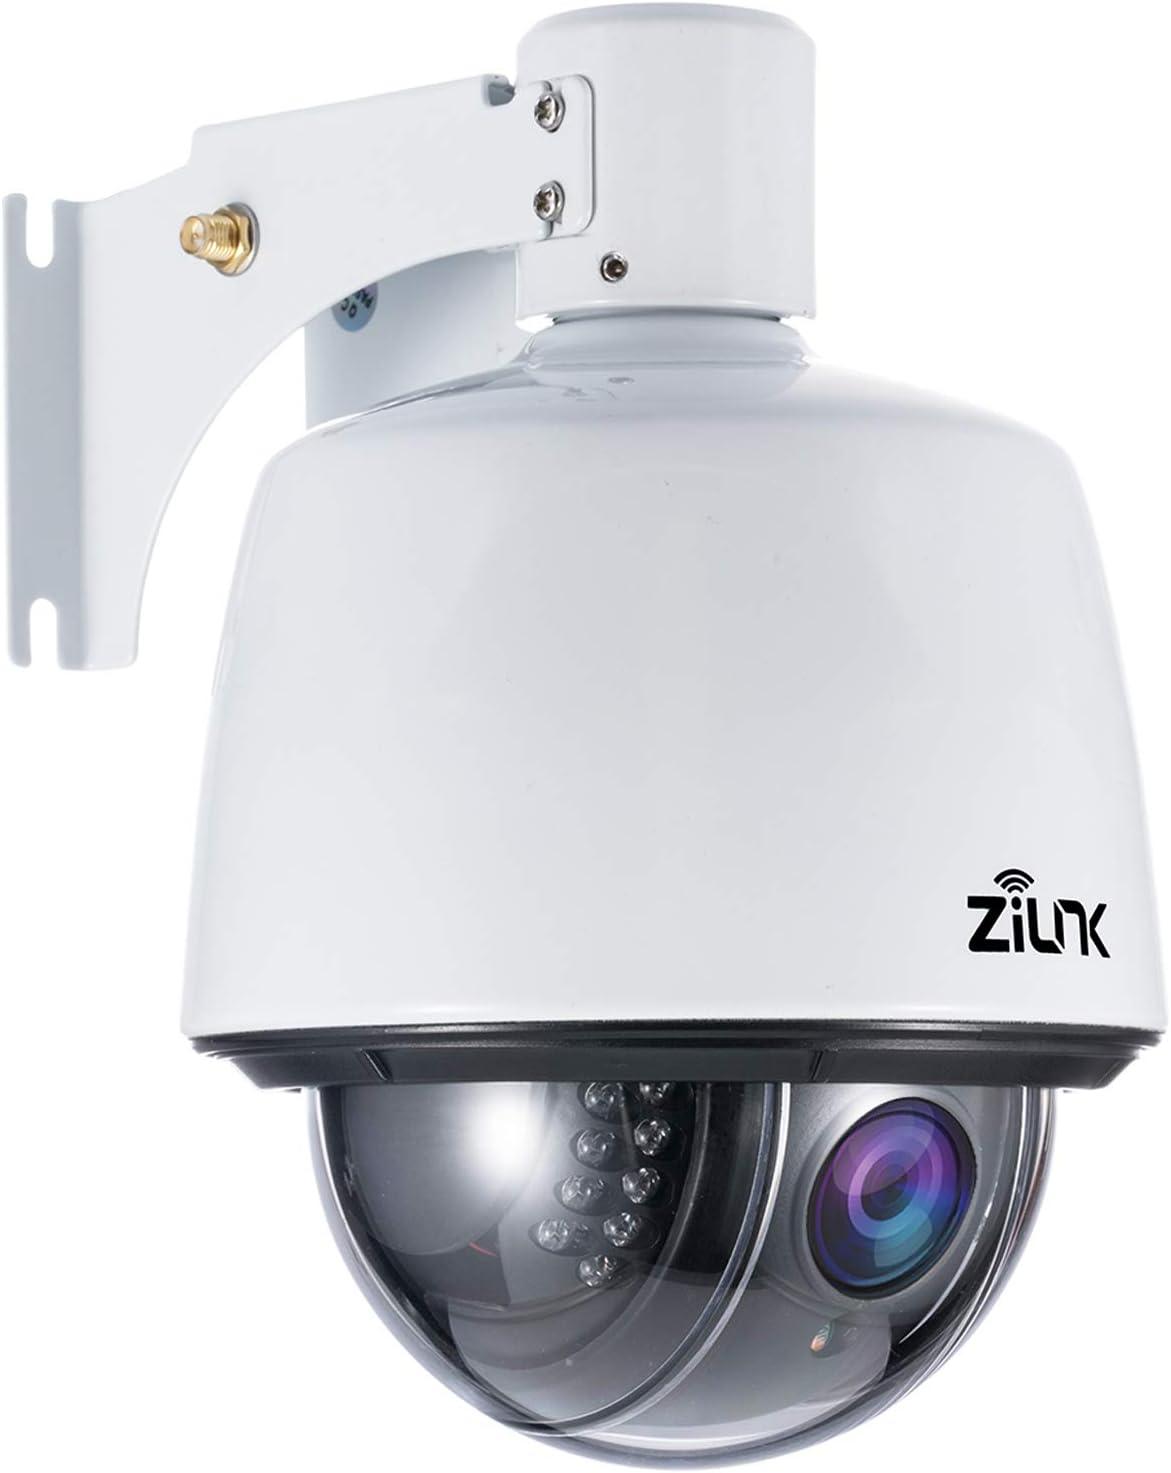 ZILNK PTZ IP Dome Kamera Outdoor, Überwachungskamera